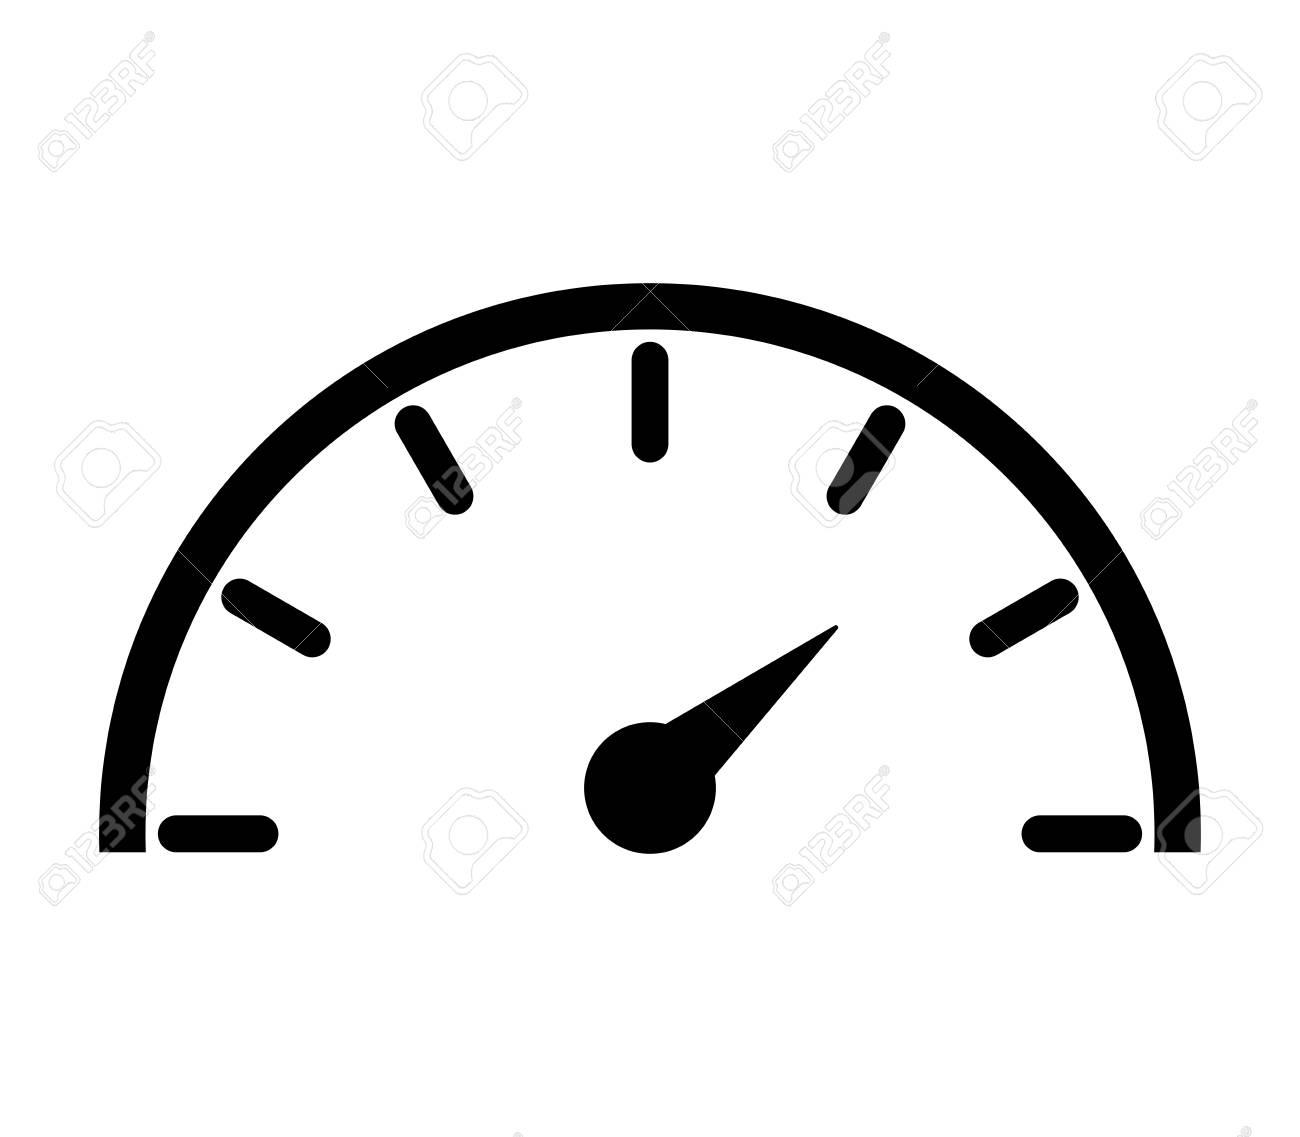 speedometer icon royalty free cliparts vectors and stock rh 123rf com speedometer vector icon speedometer vector icon